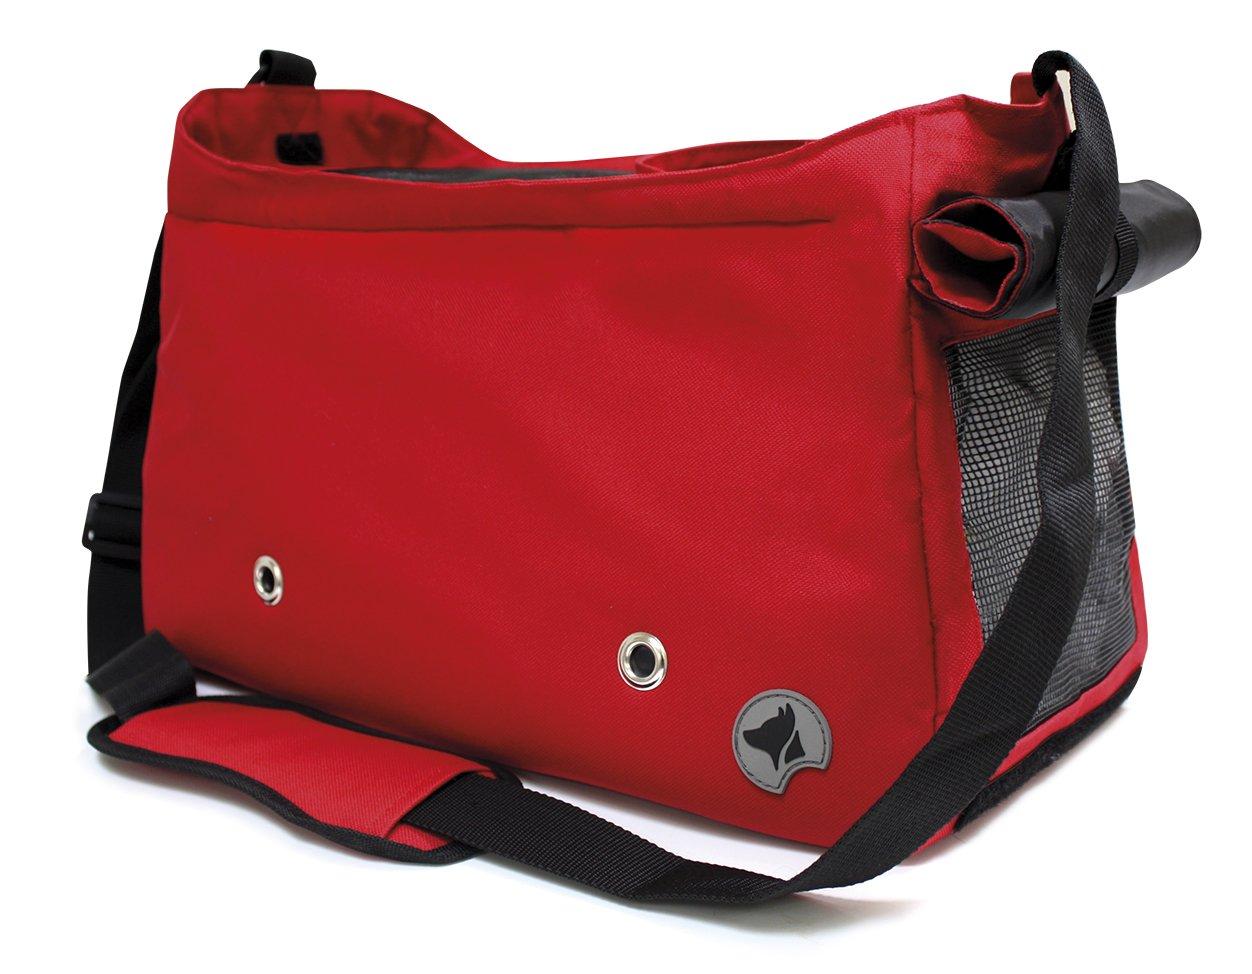 Croci Megan Bolsa, 40 x 20 x 27 cm, Color Rojo 40x 20x 27cm C2078173